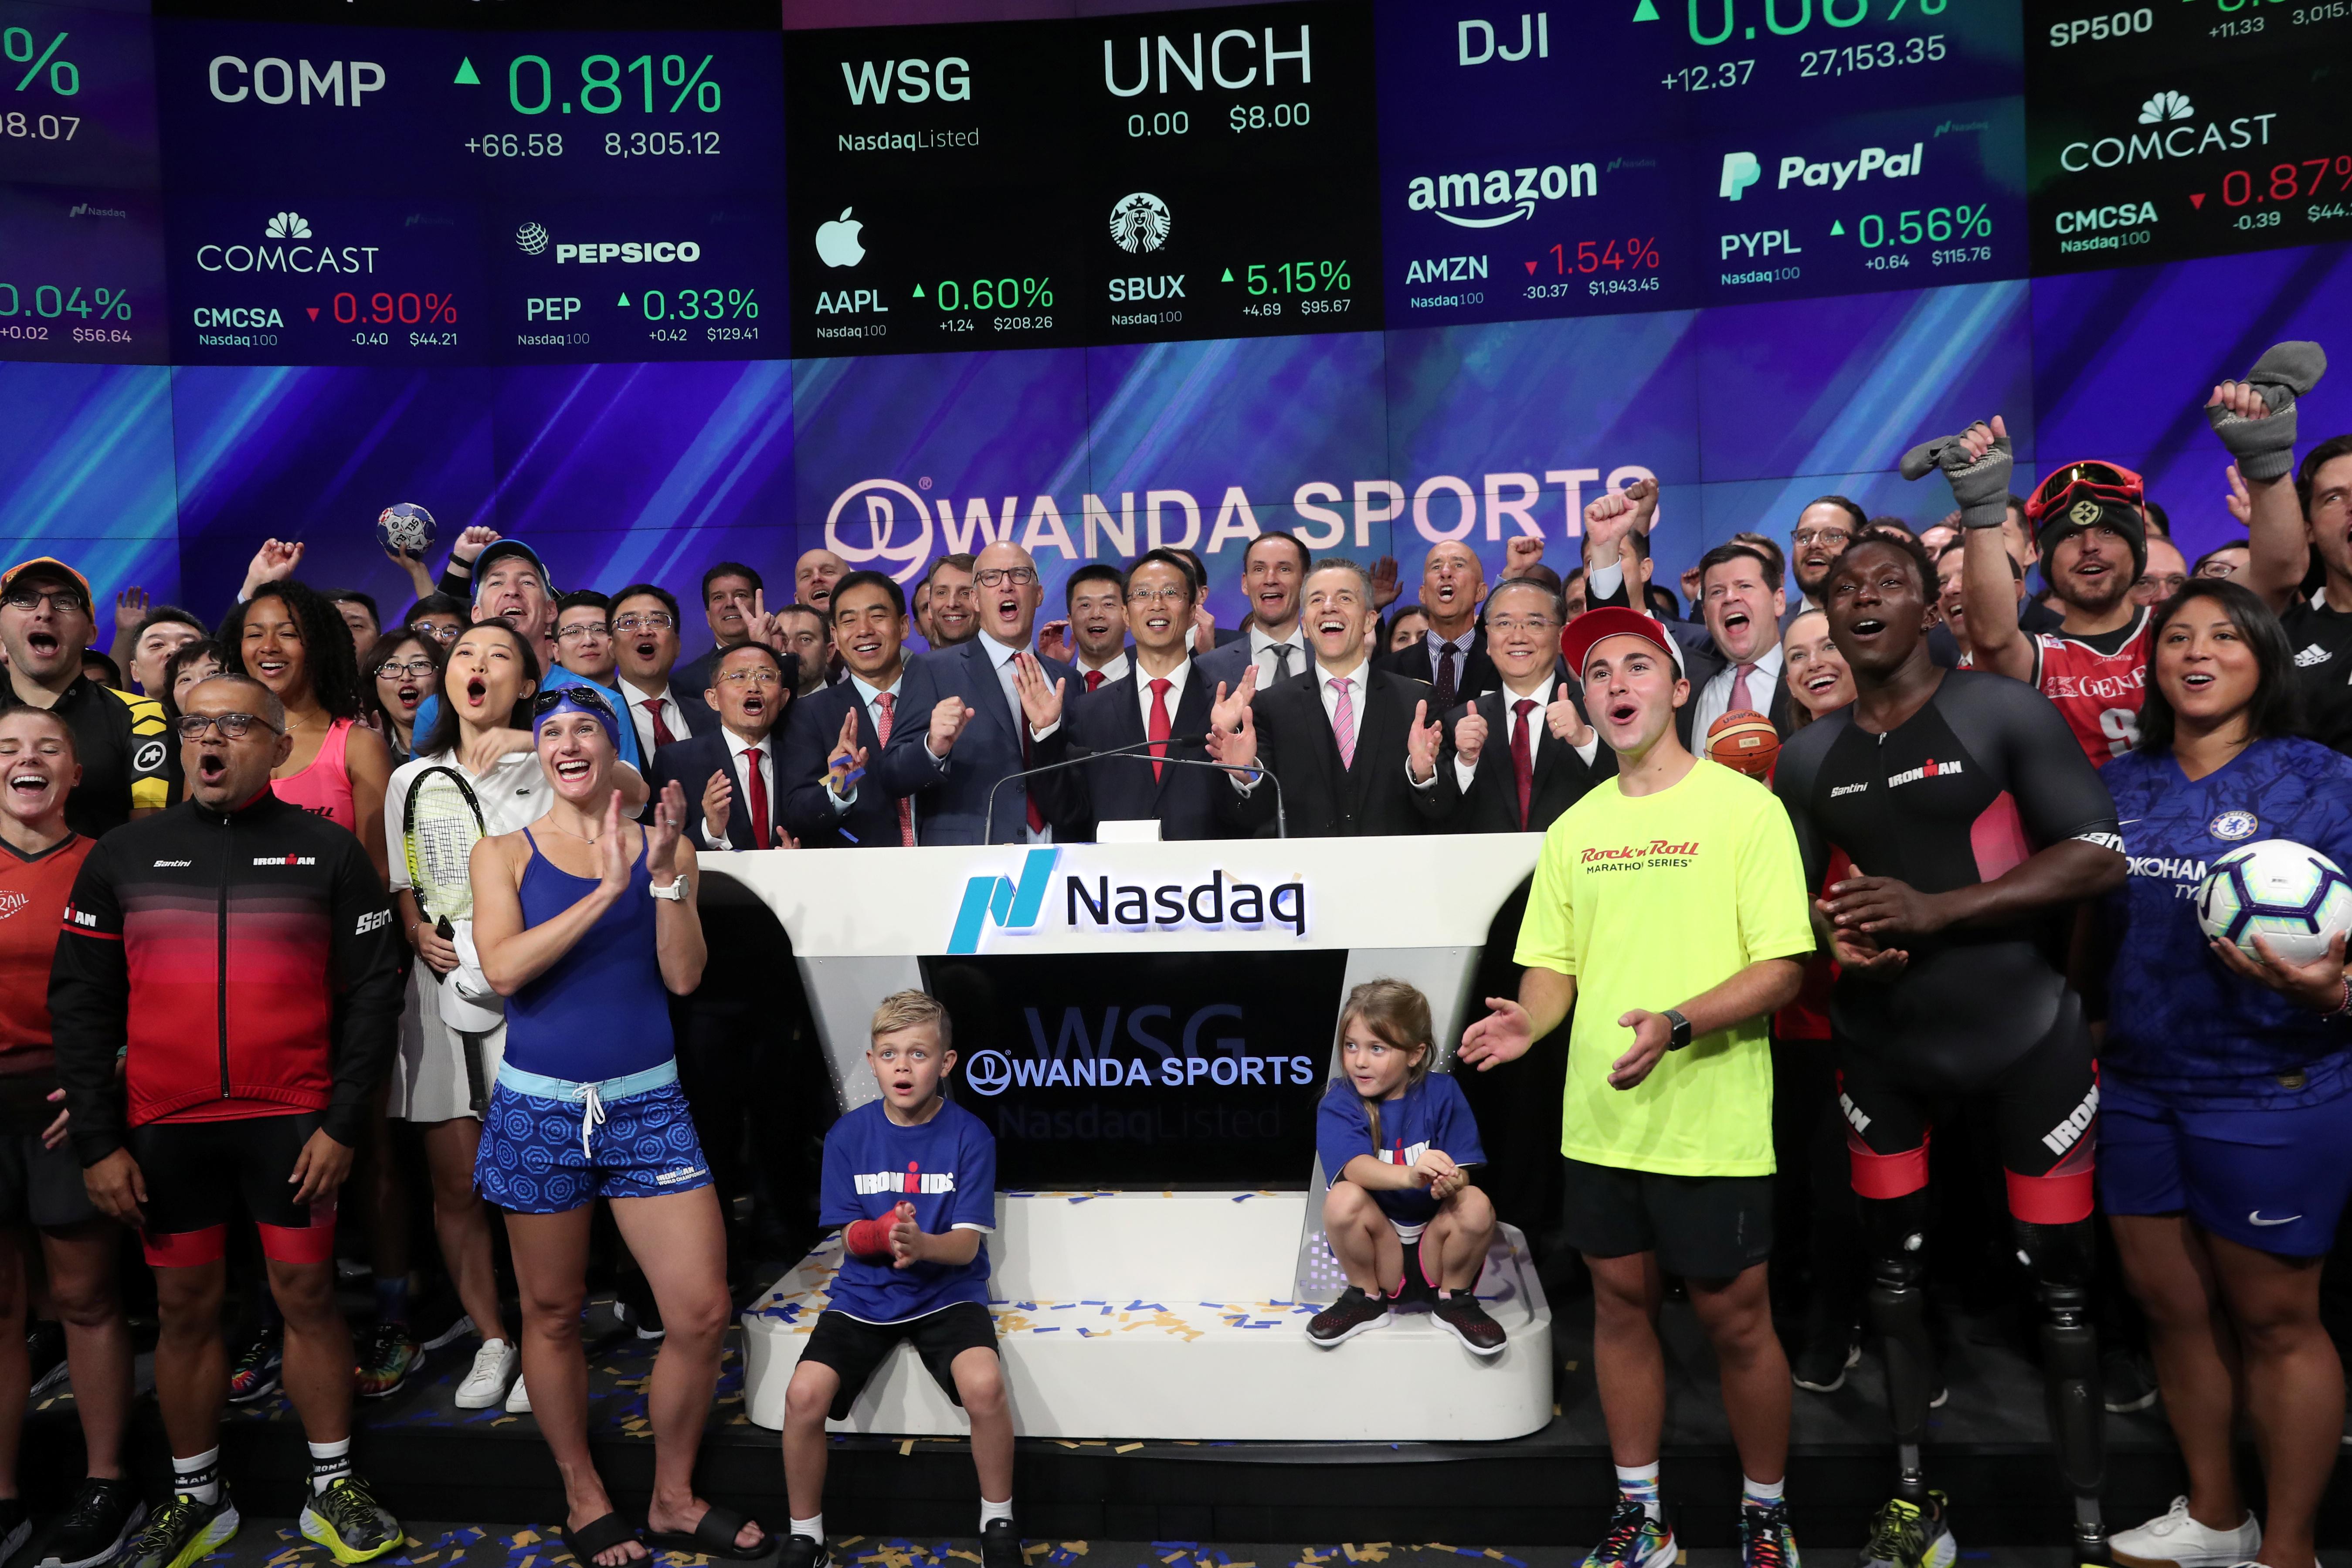 China's Wanda Sports raises $190 4 million in downsized IPO